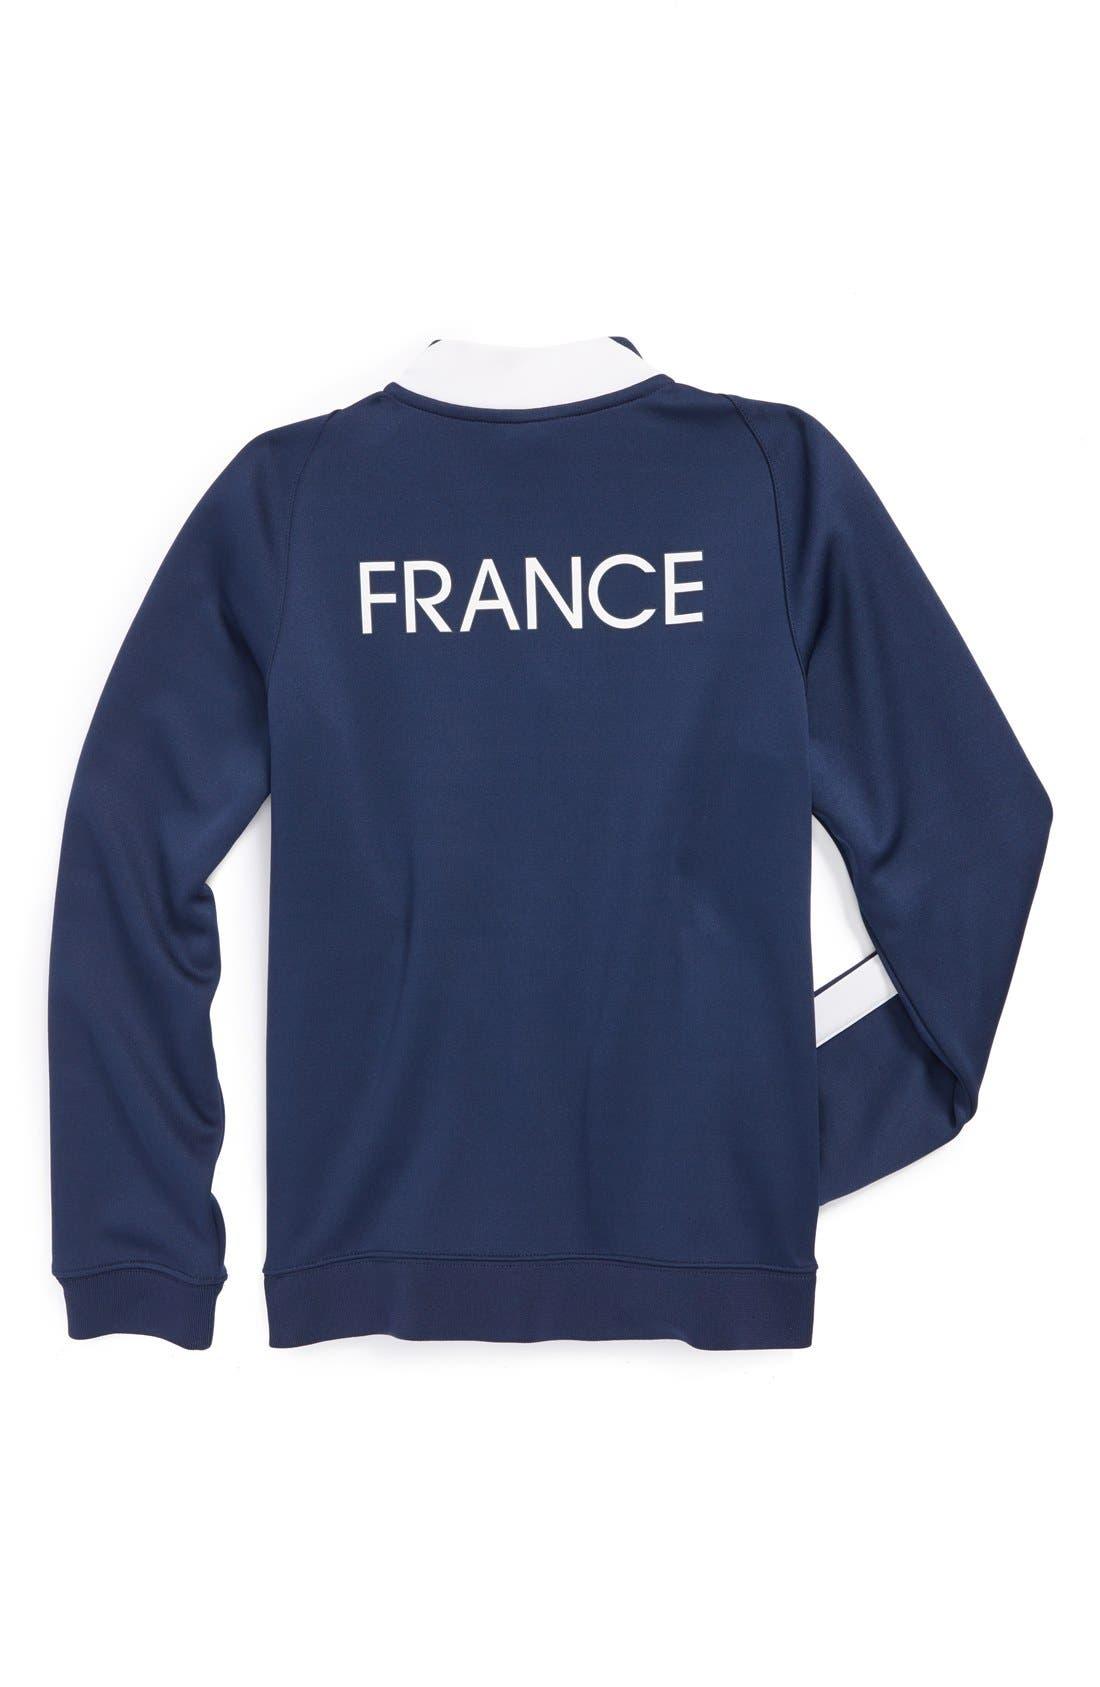 Alternate Image 2  - Nike 'France FFF - N98 World Soccer Authentic' Track Jacket (Big Boys)